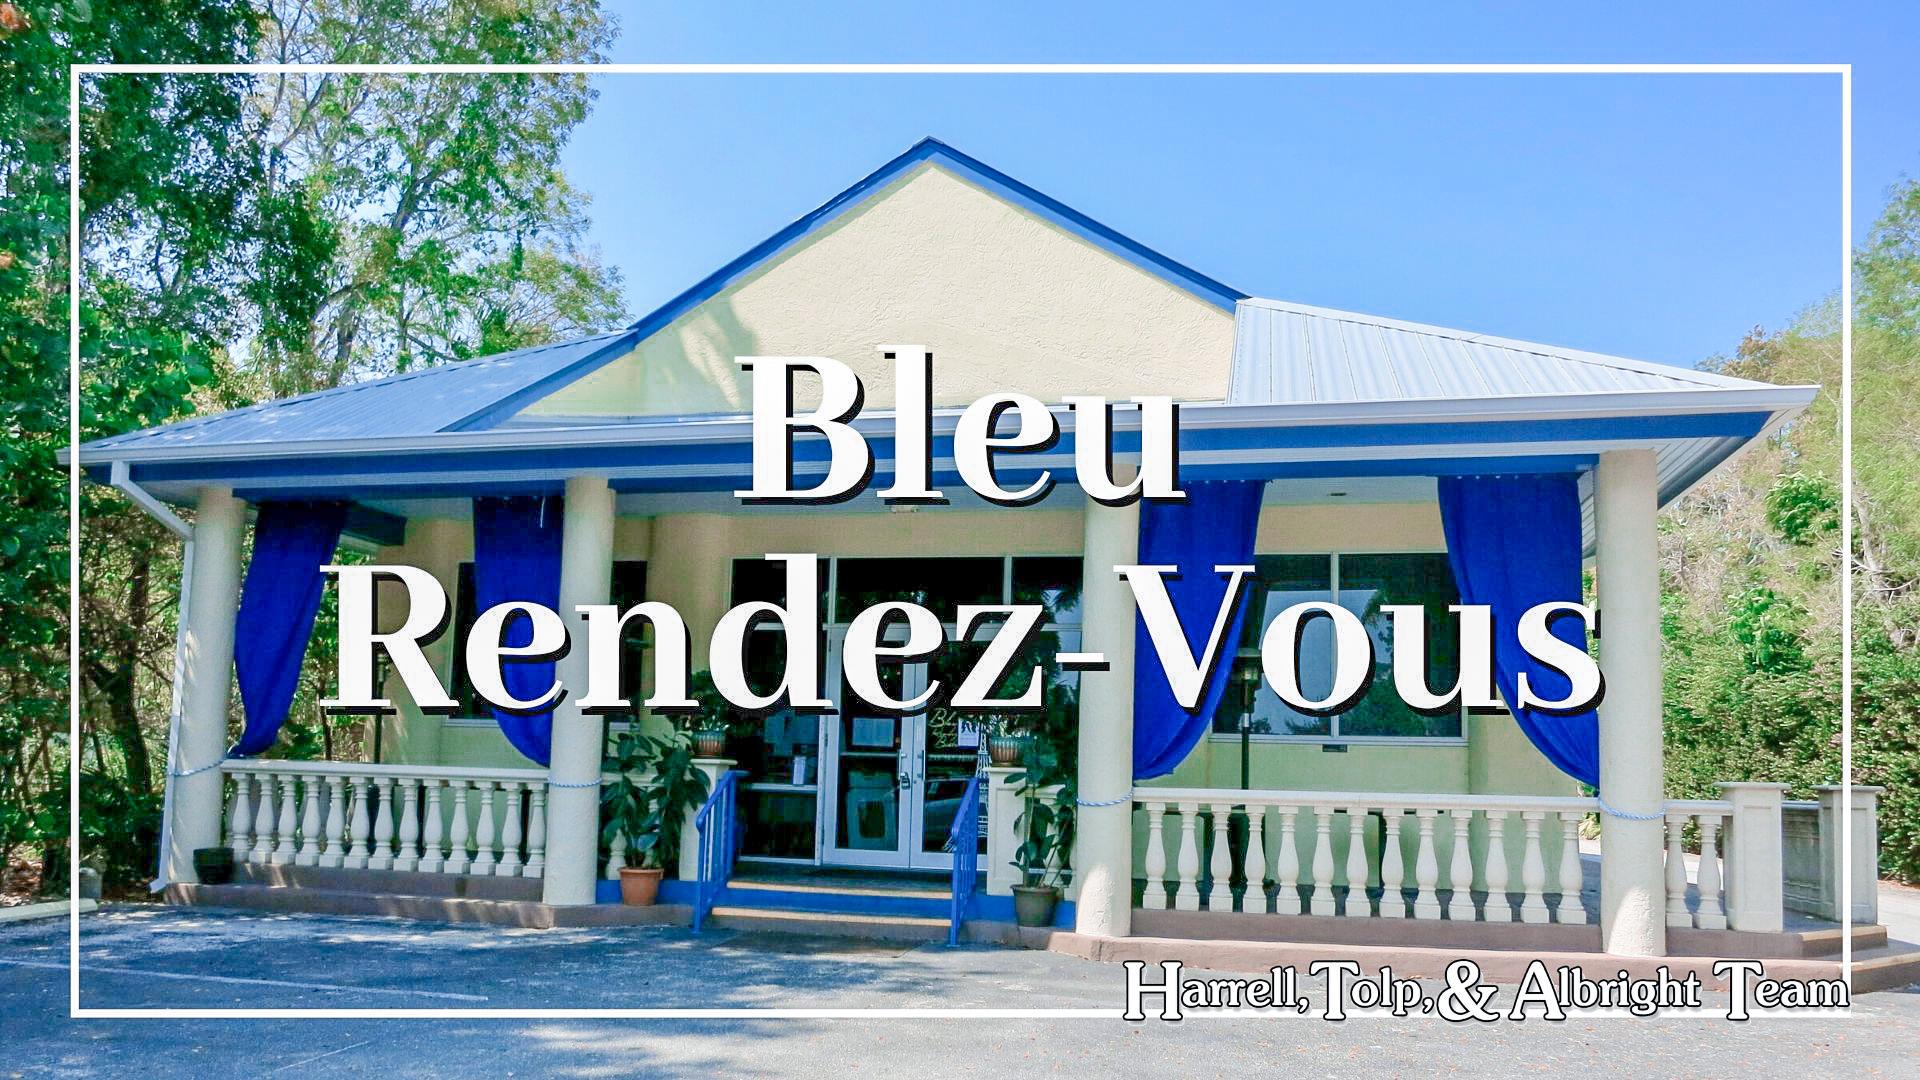 Bleu Rendez-Vous